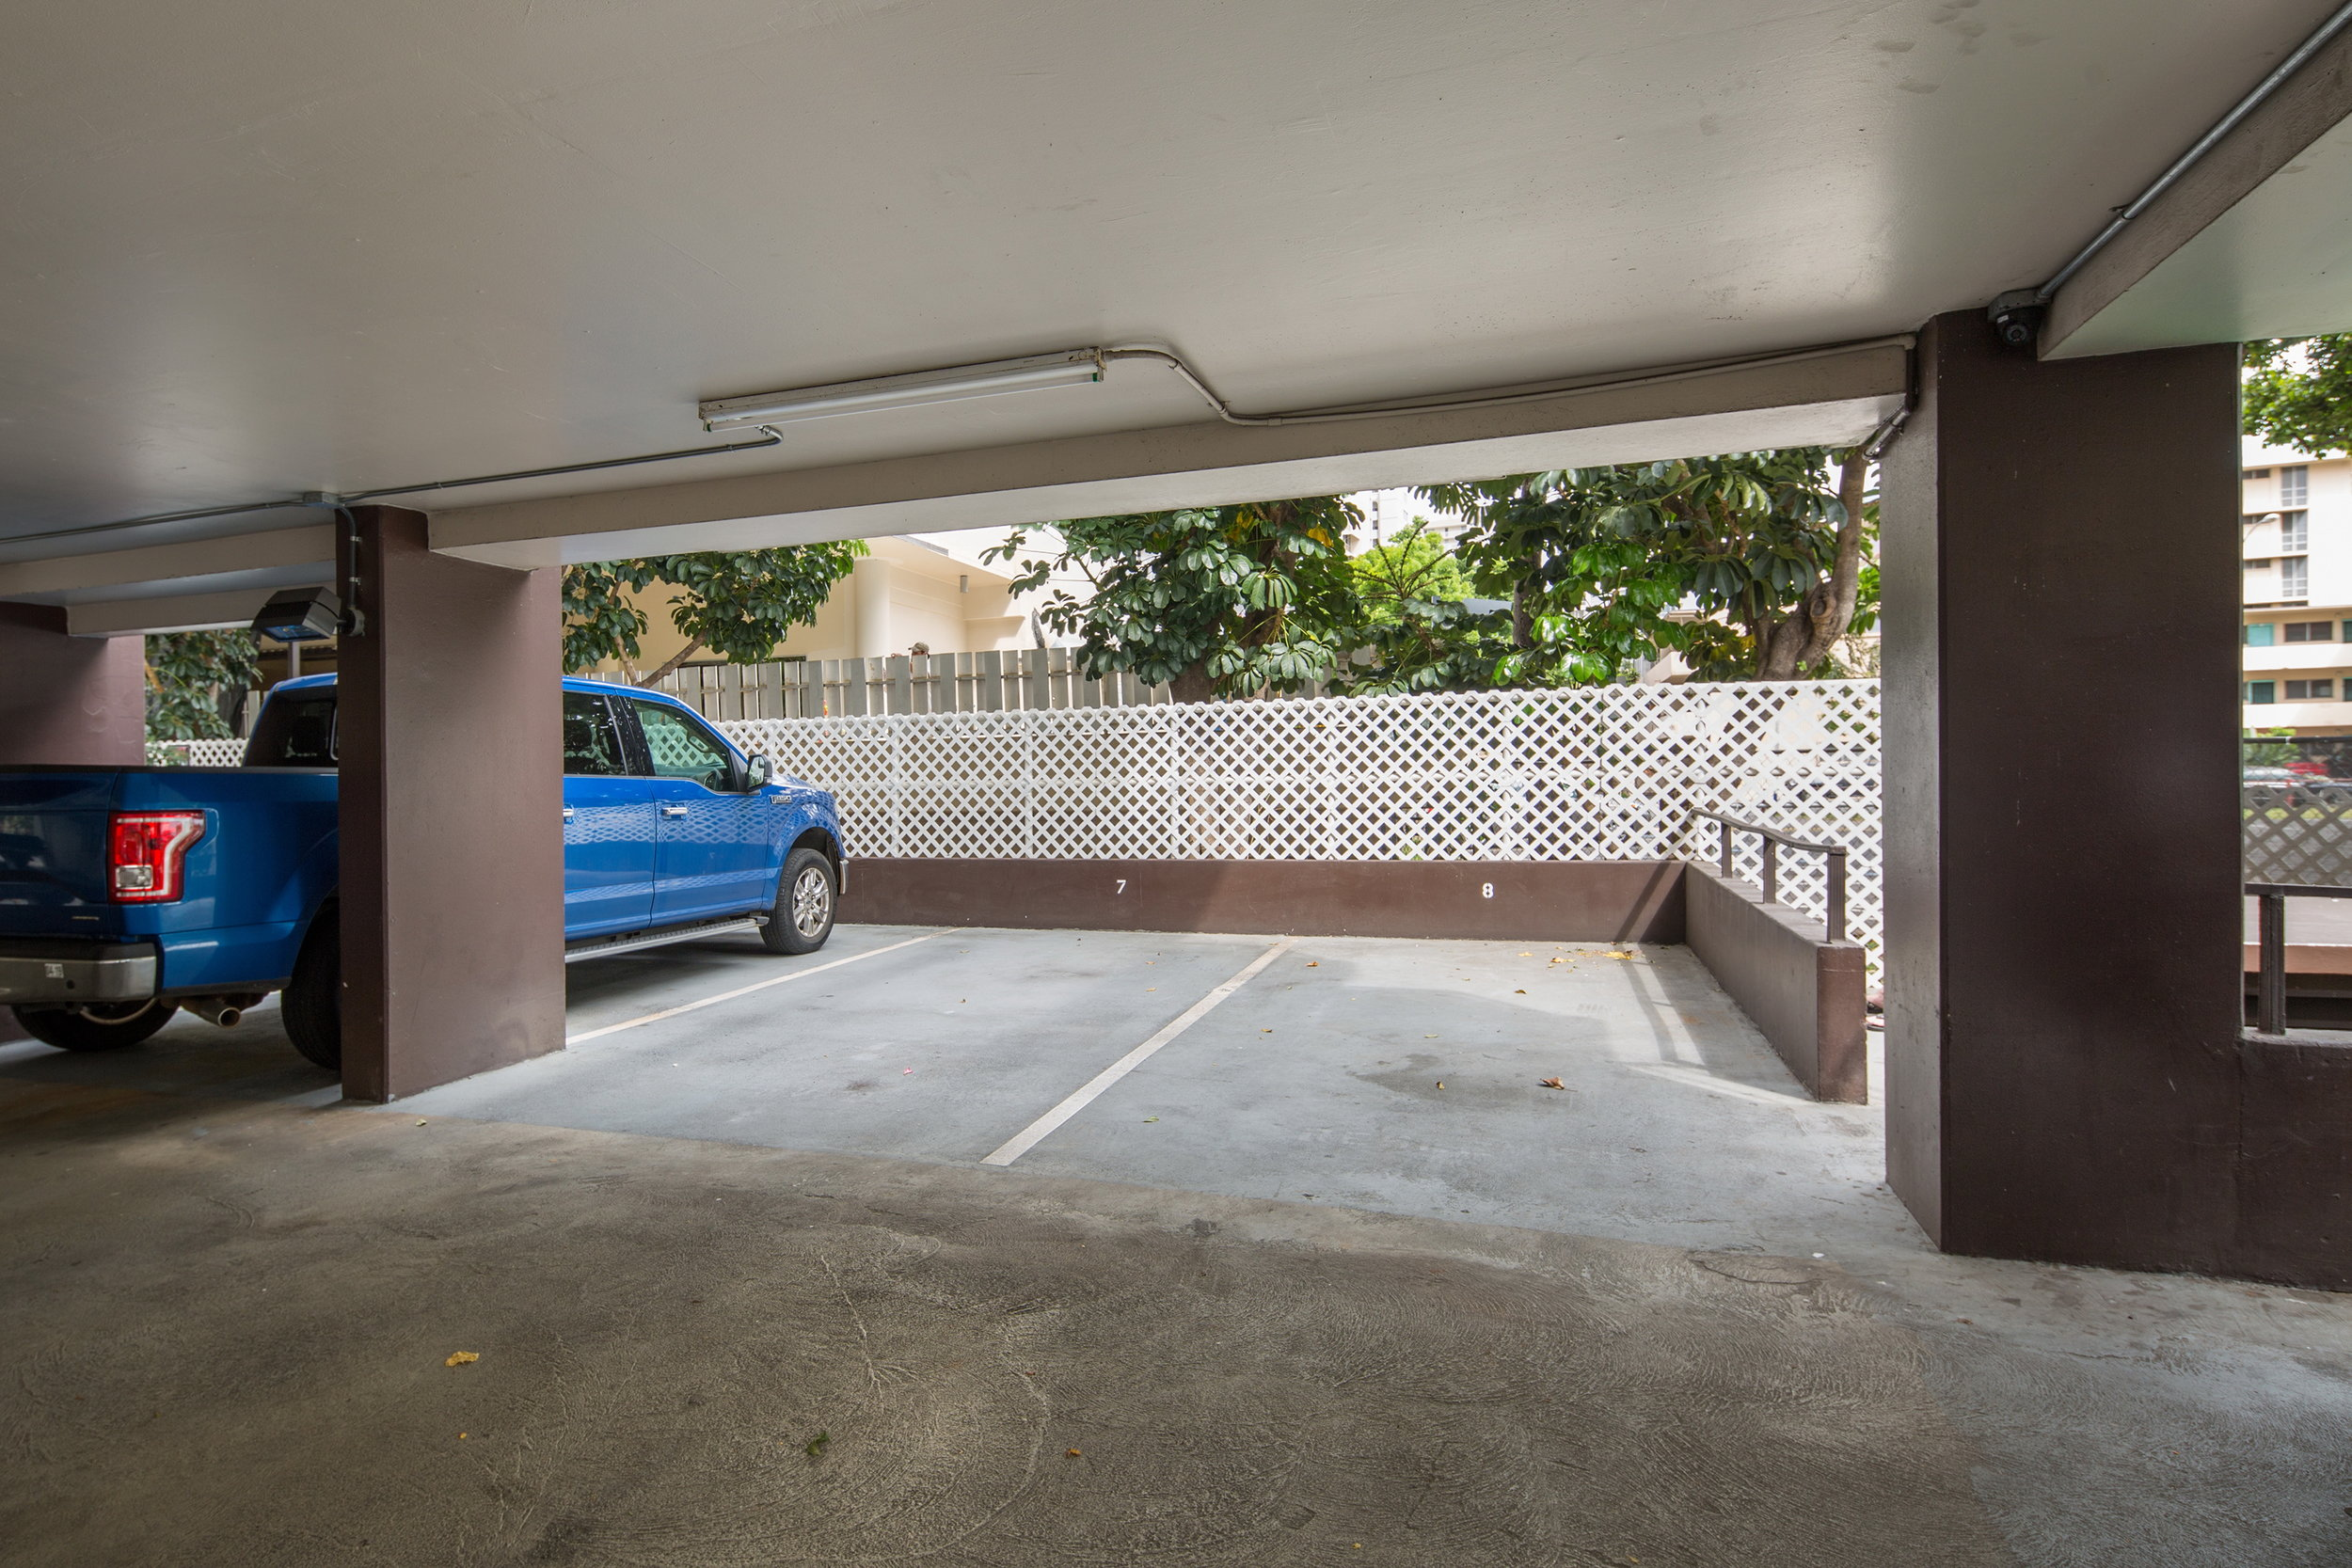 Parking stall.jpg